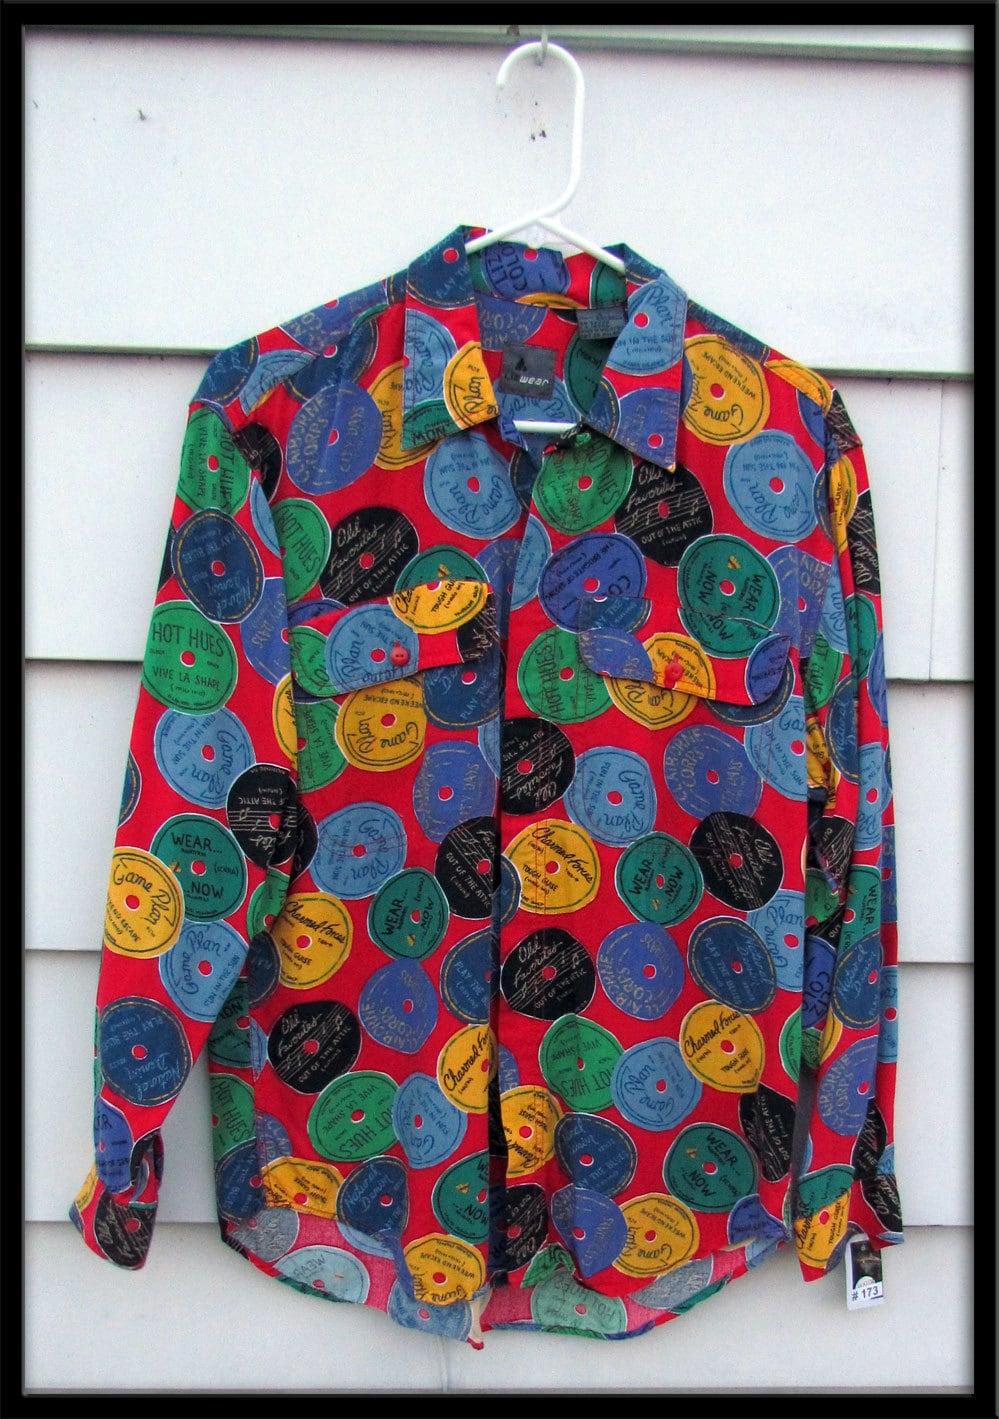 Mens 1980s Vintage Shirt 45 Vinyl Record Labels Rayon Liz